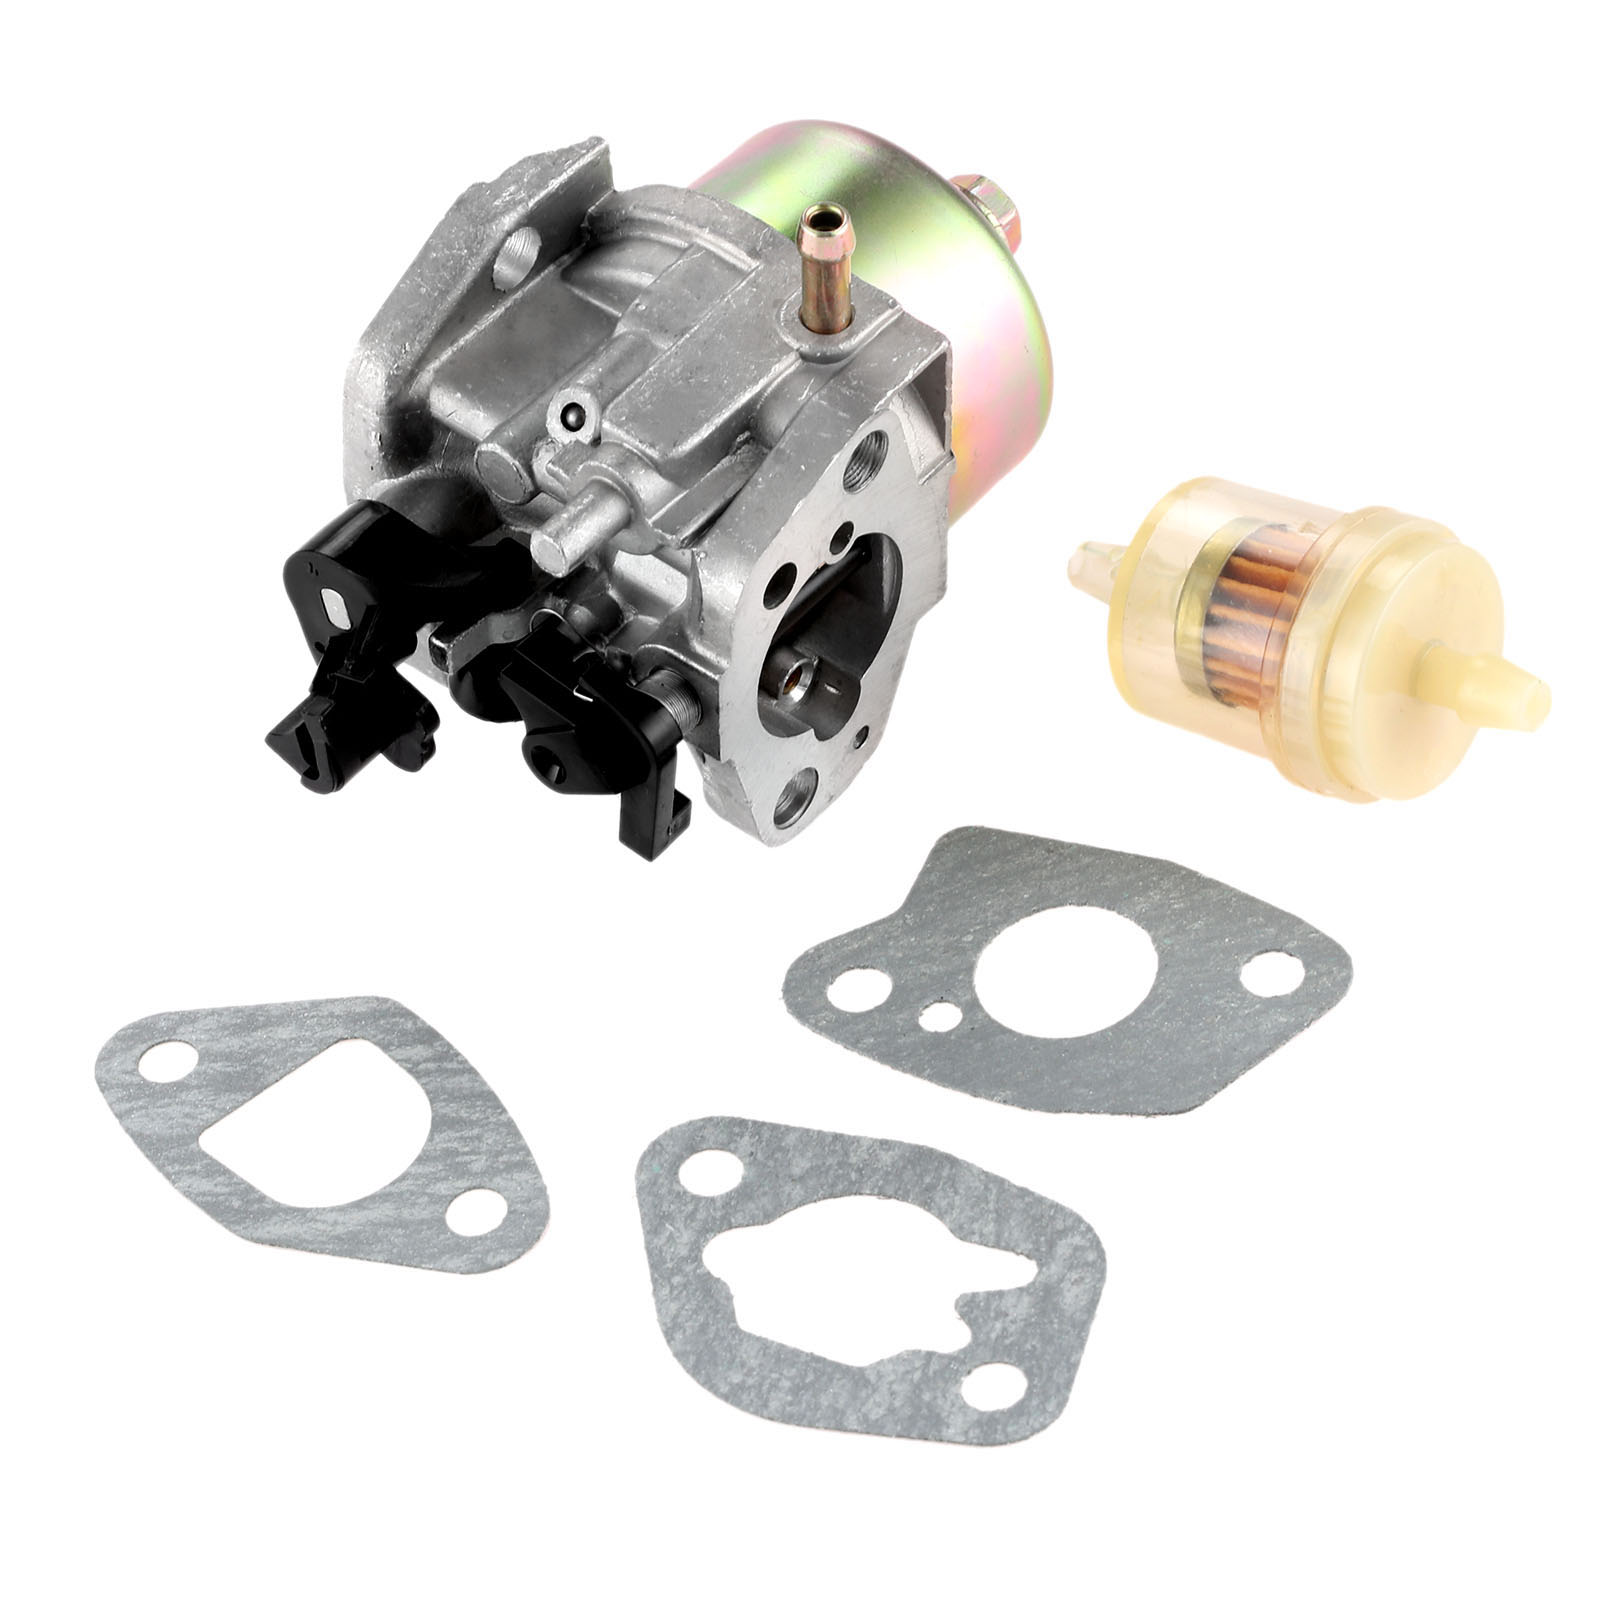 small resolution of dreld carburetor with carburetor gasket fuel filter for mtd cub cadet troy bilt lawn mower engines